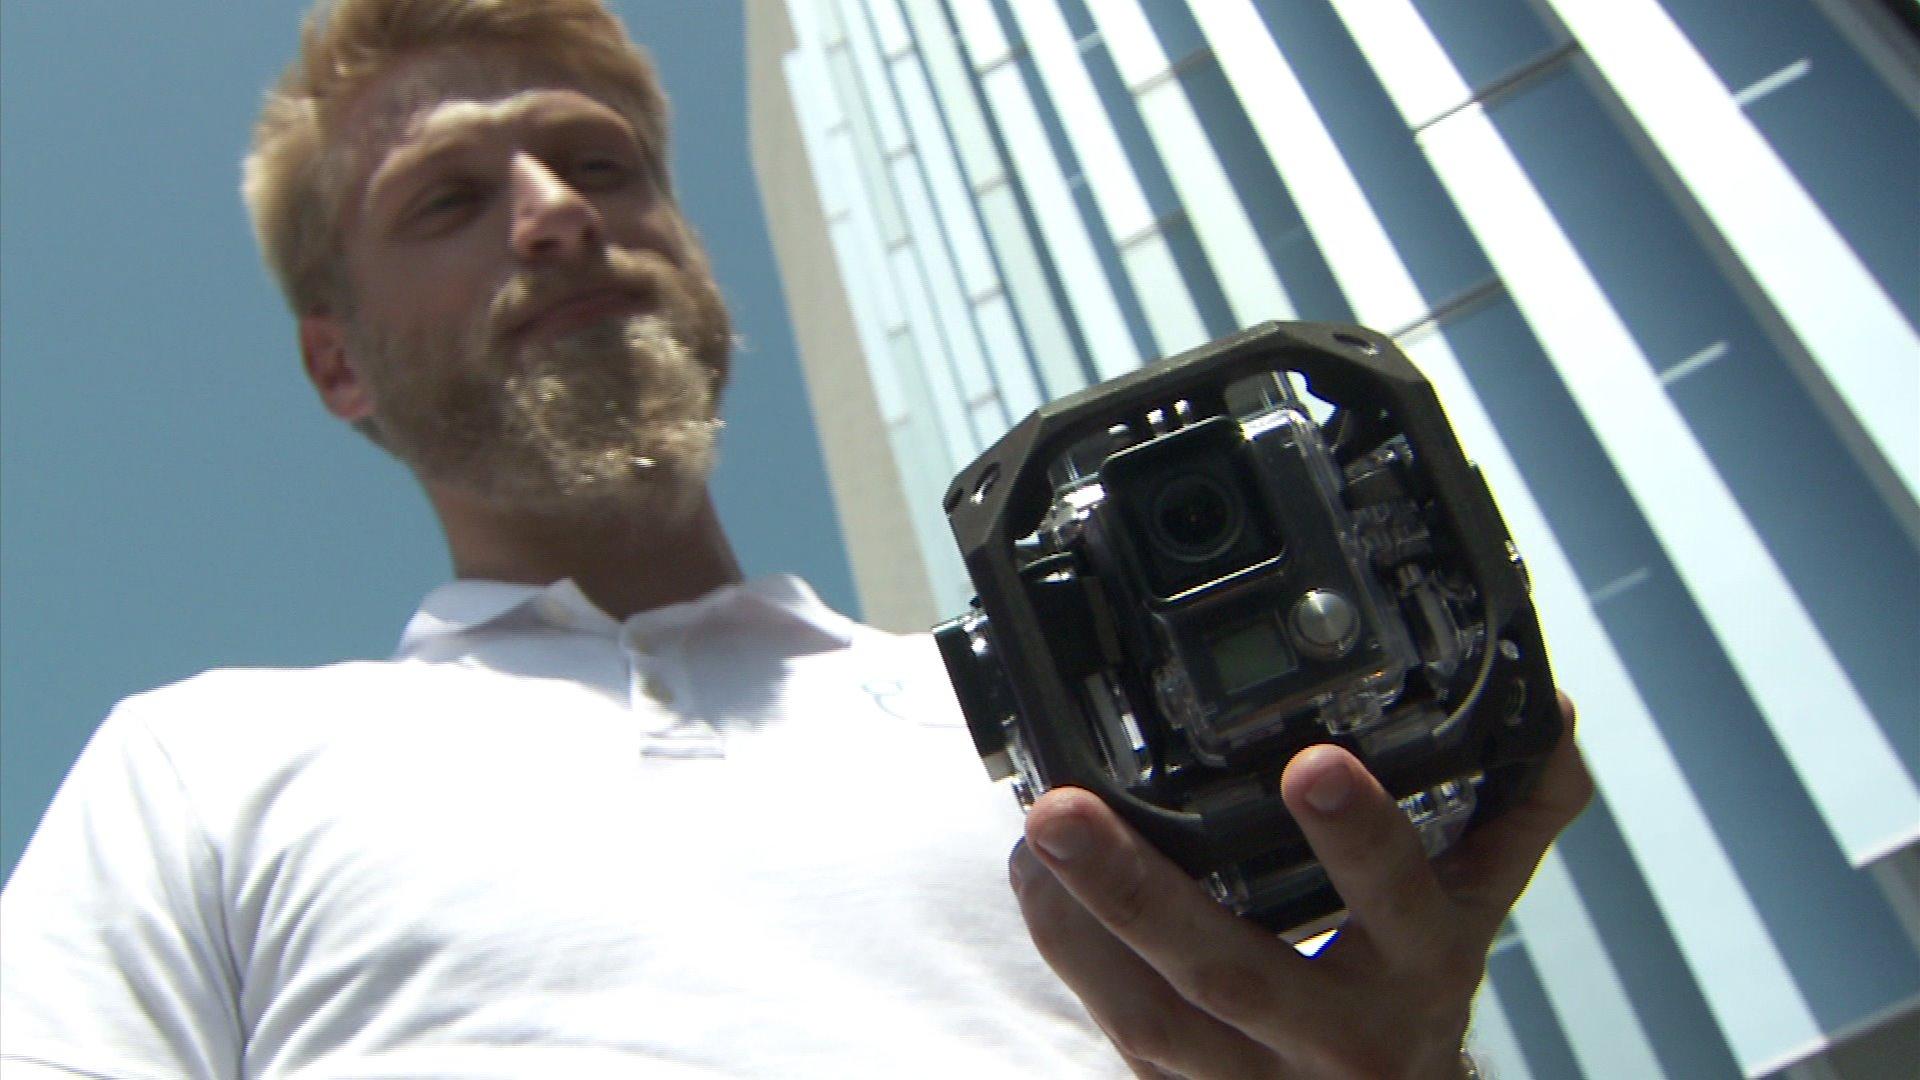 ryan moore experience 360 los angeles virtual reality